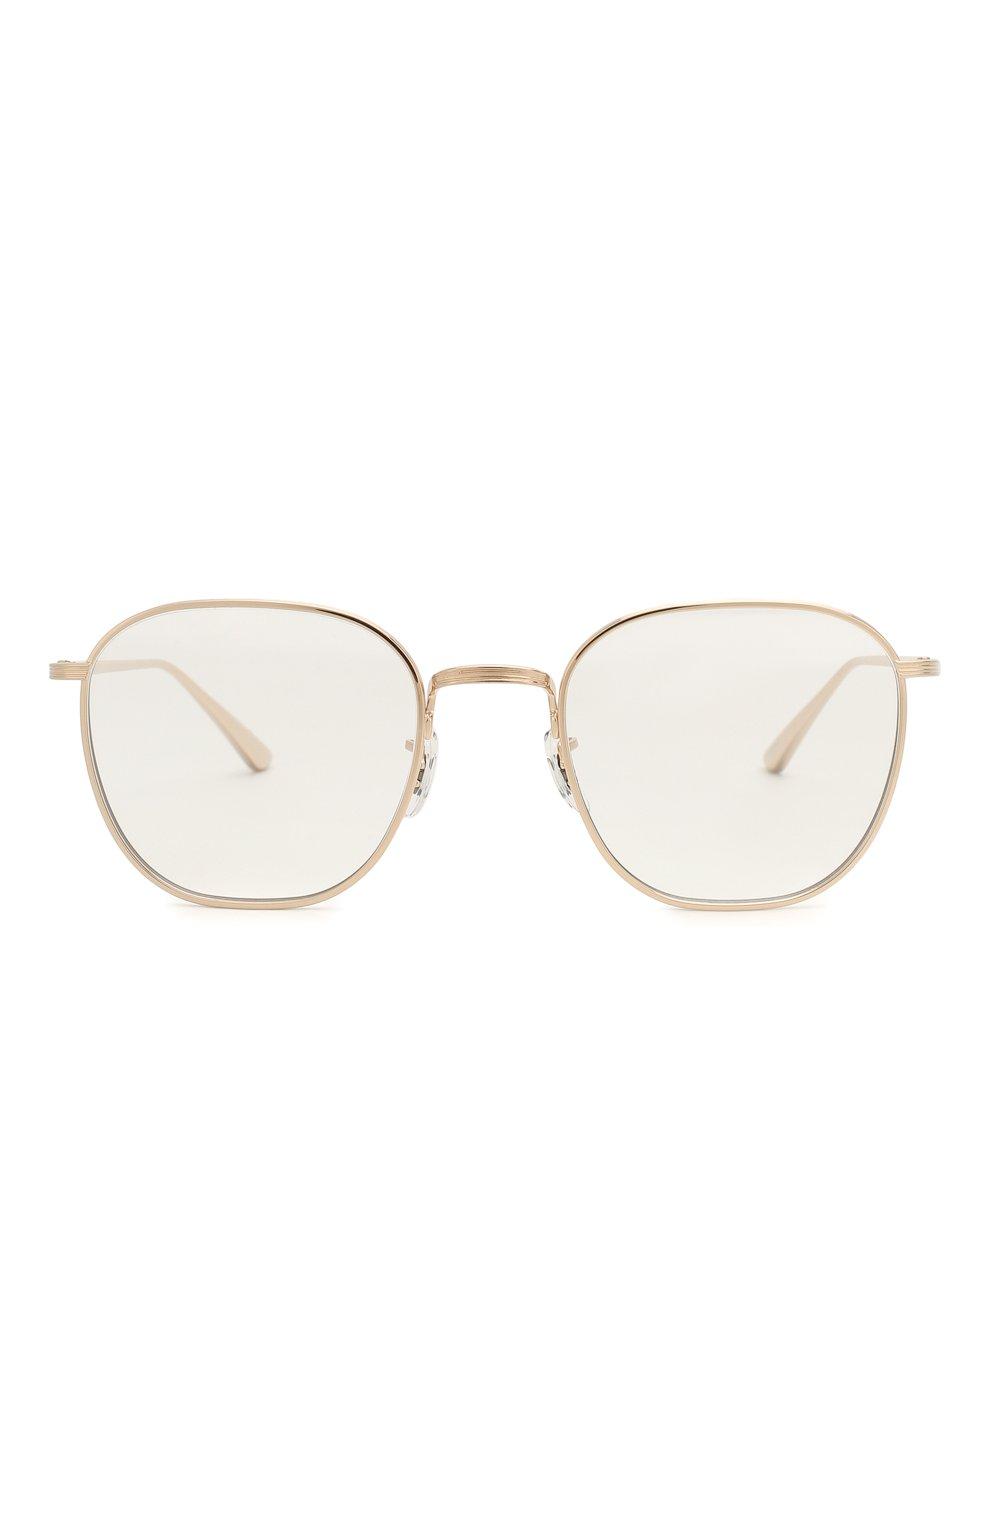 Женские солнцезащитные очки THE ROW X OLIVER PEOPLES золотого цвета, арт. 1230ST-52921W   Фото 4 (Тип очков: С/з; Очки форма: Круглые; Оптика Гендер: оптика-унисекс)